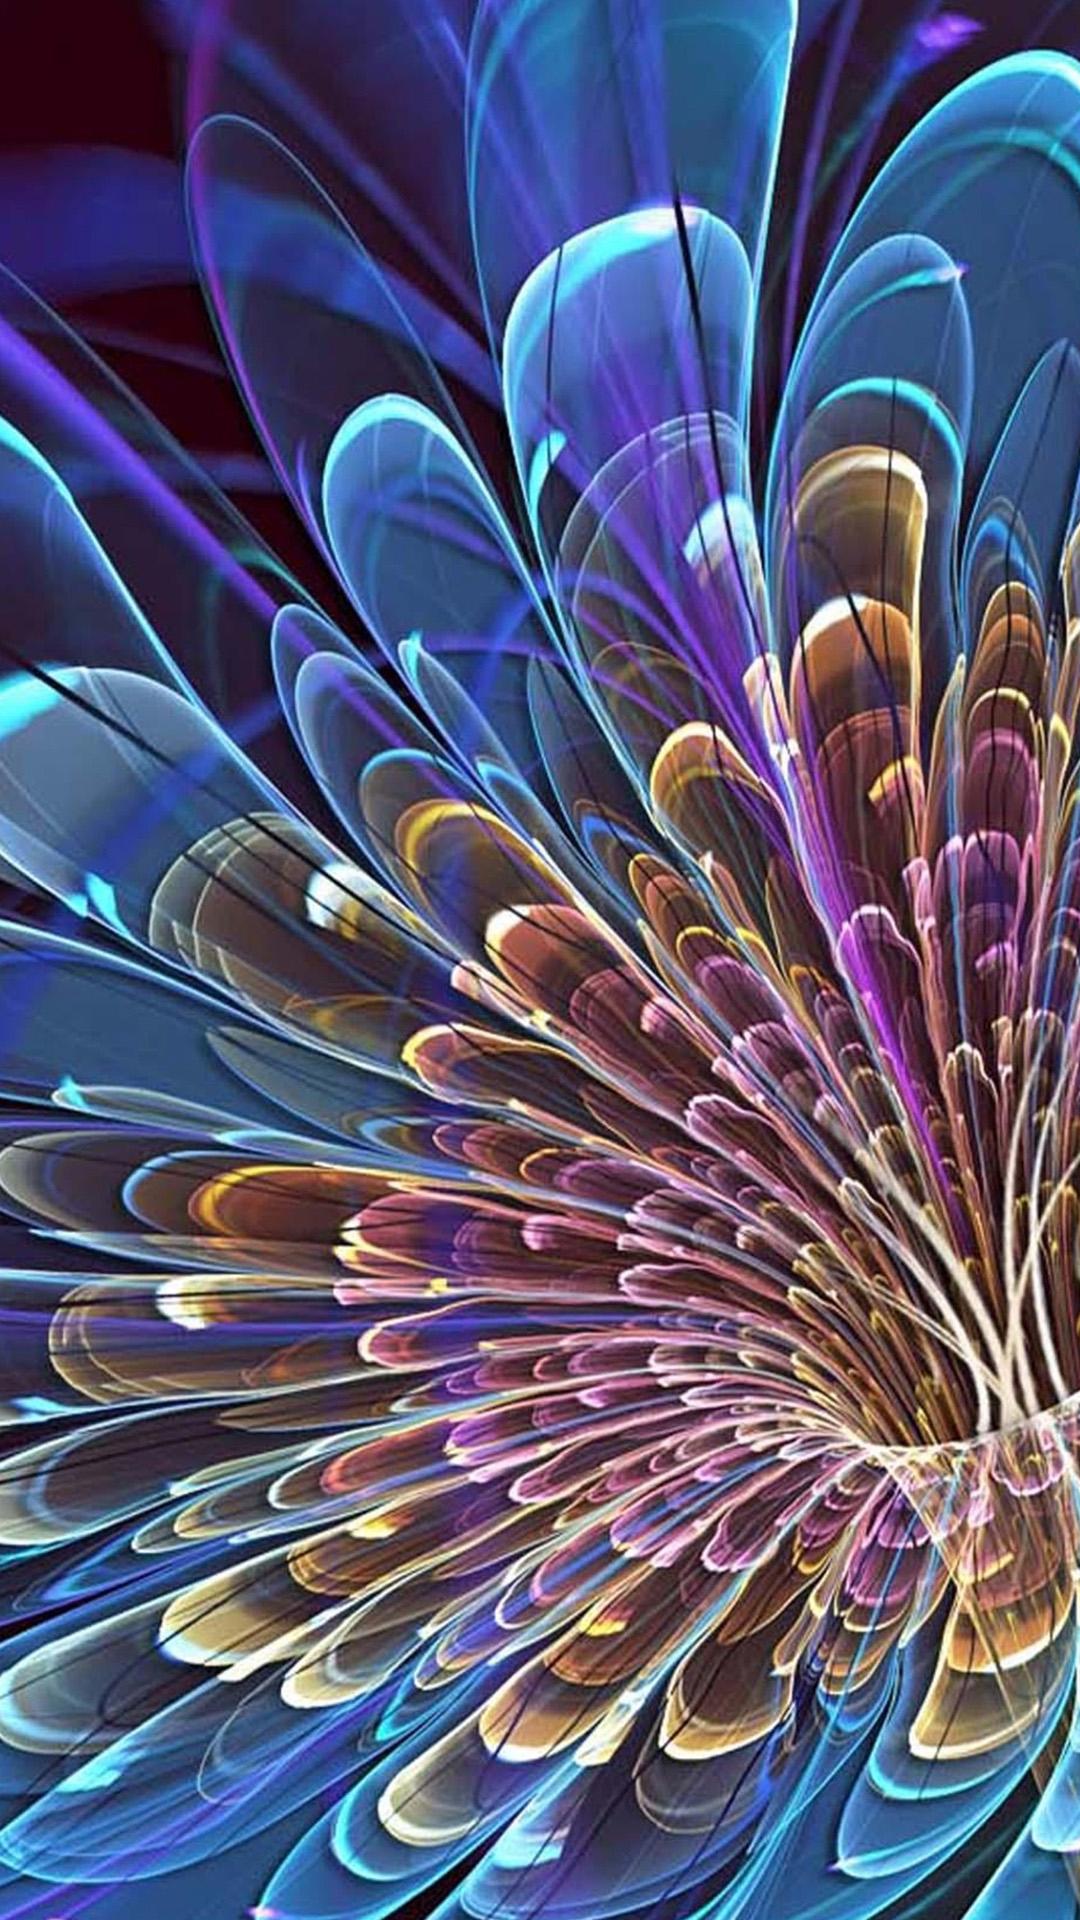 Fondo de pantalla abstracto con colores